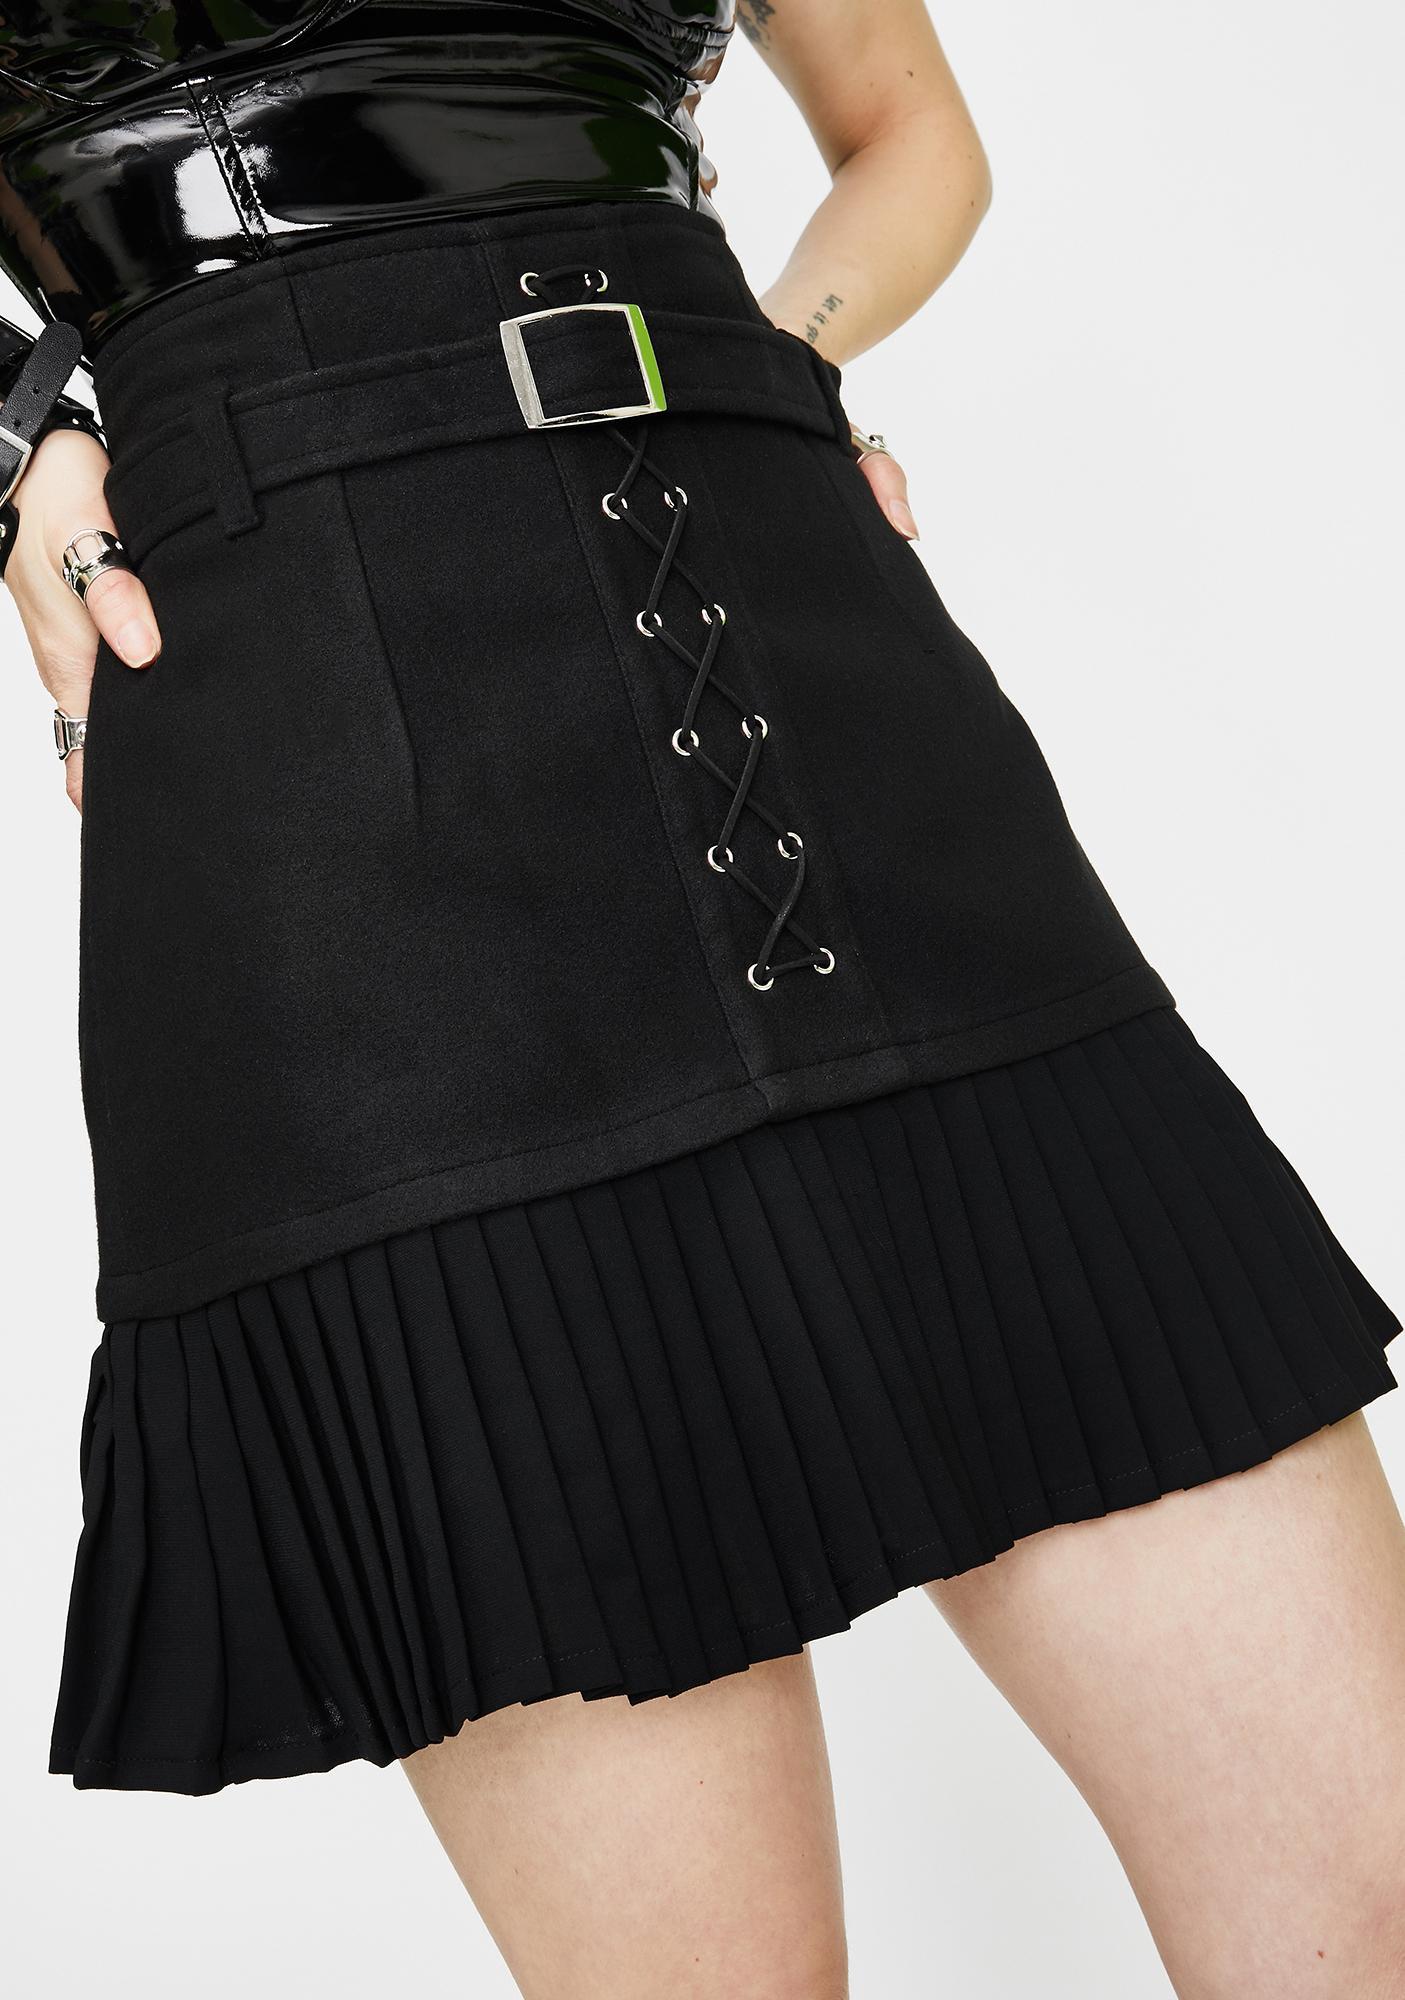 Punk Rave Punk Pleated Mini Skirt